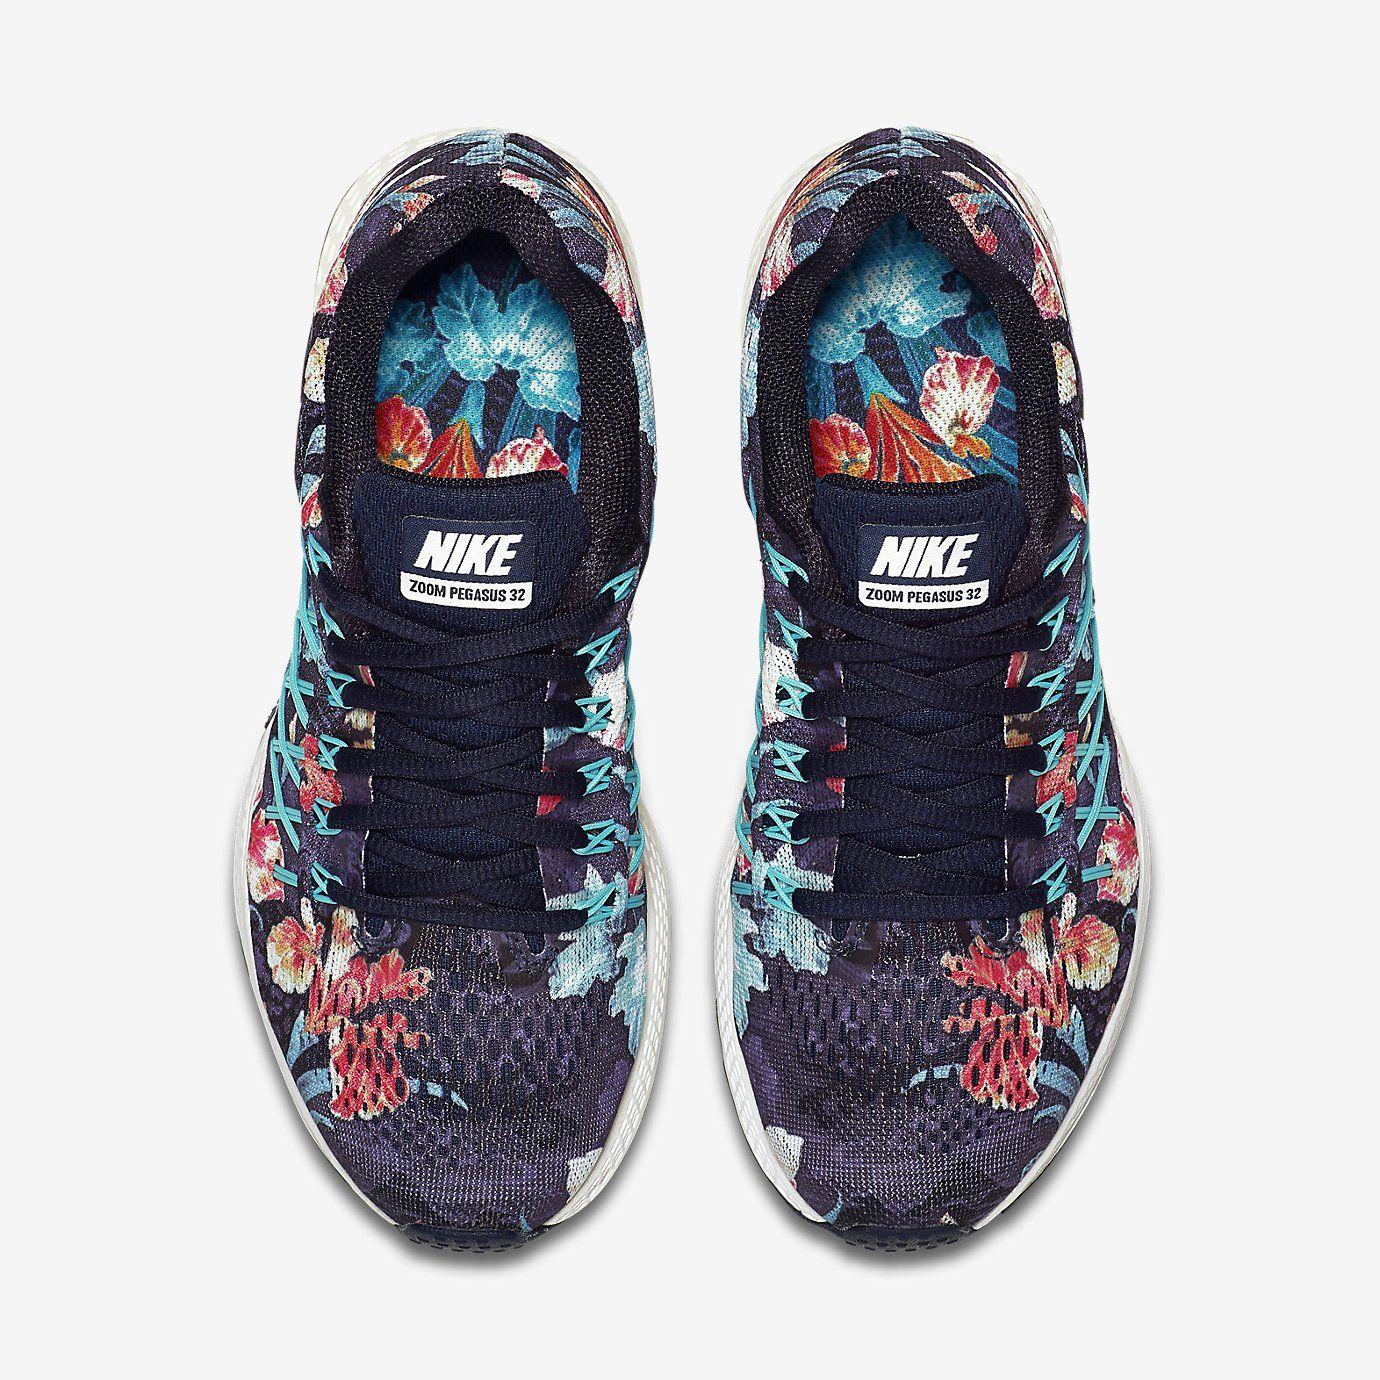 detailed look f900b 7ae92 Nike Air Zoom Pegasus 32 Photosynthesis Women s Running Shoe. Nike Store UK  £85